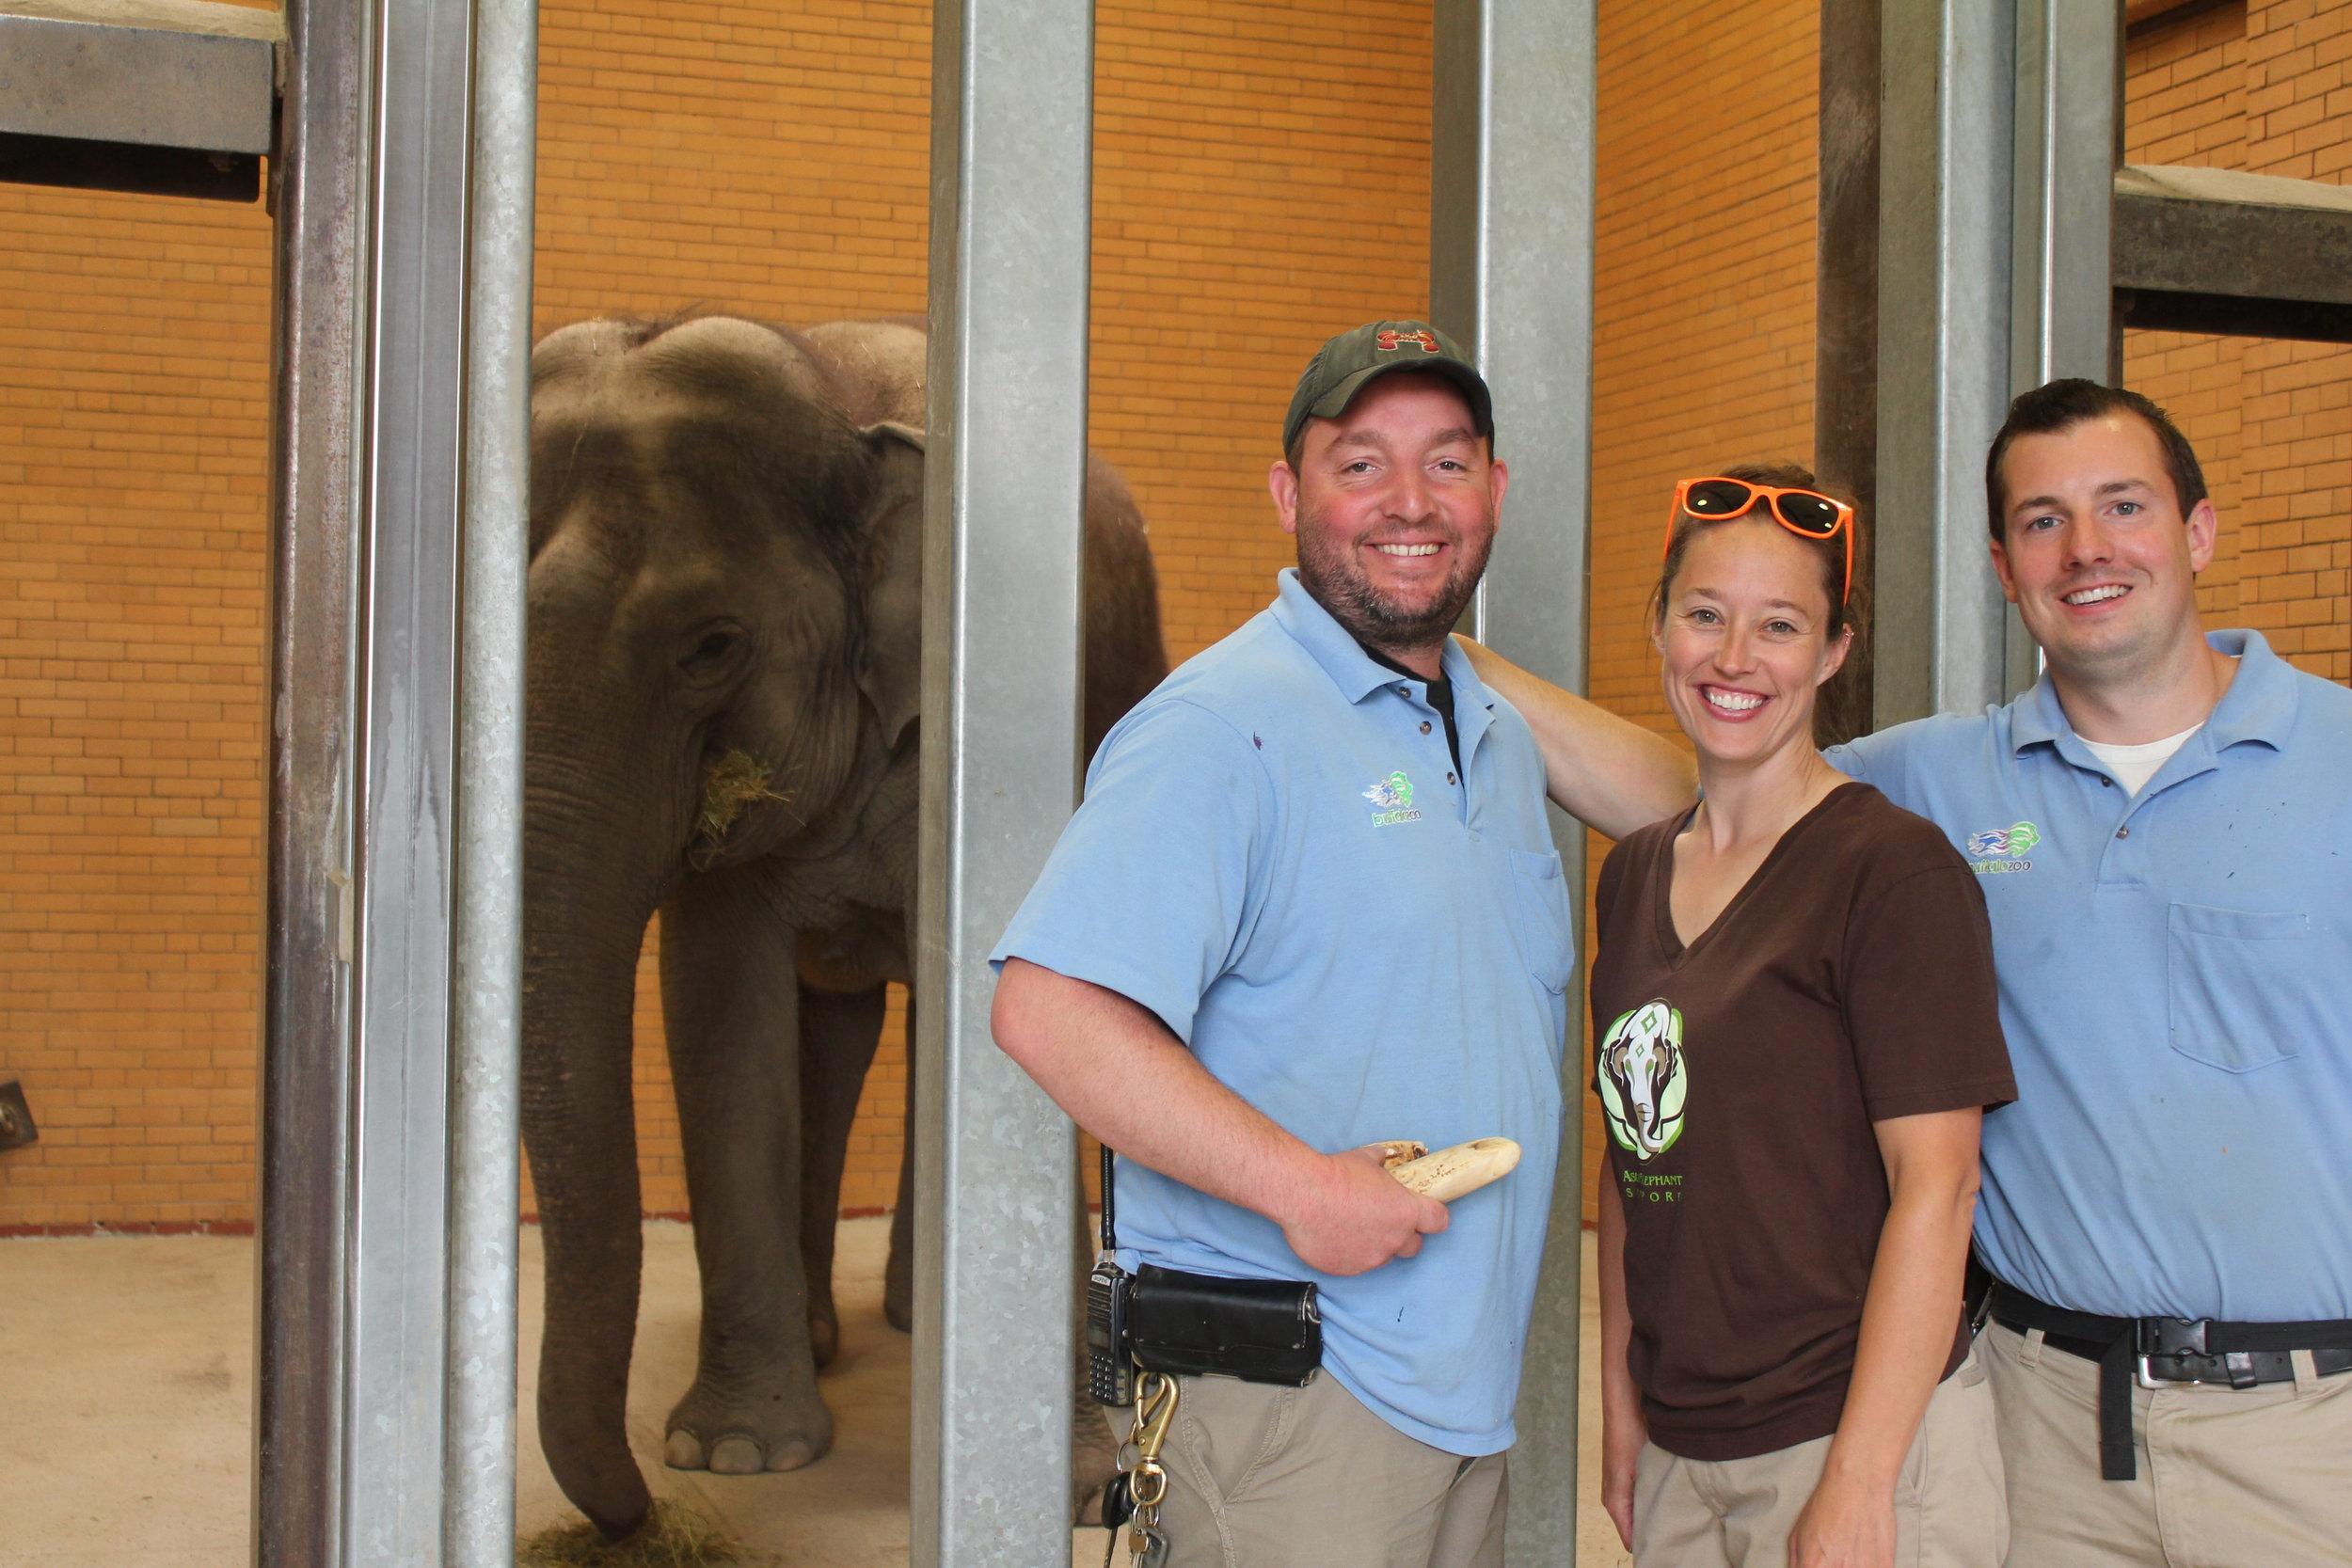 Rob Dempsey, elephant keeper, Mindy Ussrey, elephant manager, Gary Steele, elephant keeper